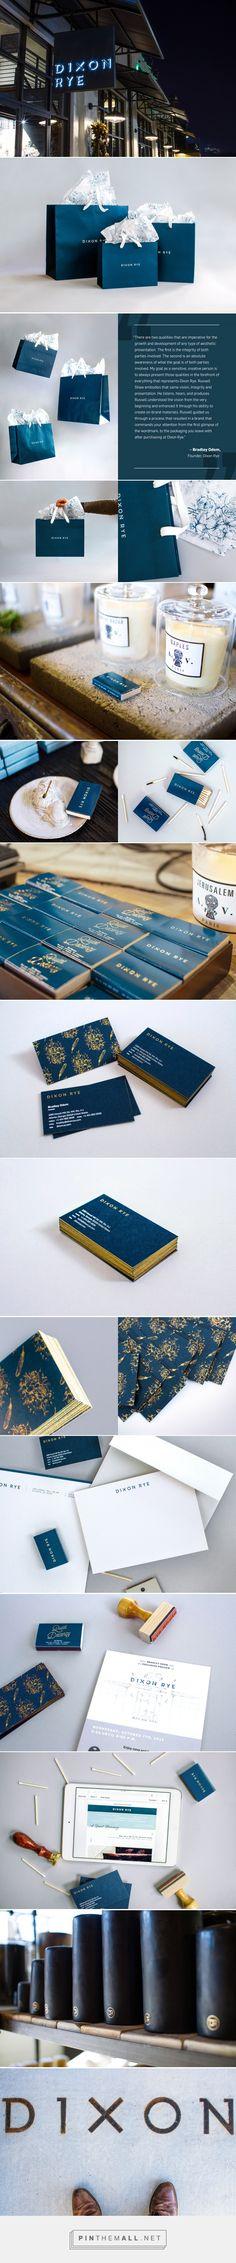 Dixon Rye Branding by Russell Shaw on Behance | Fivestar Branding – Design and Branding Agency & Inspiration Gallery